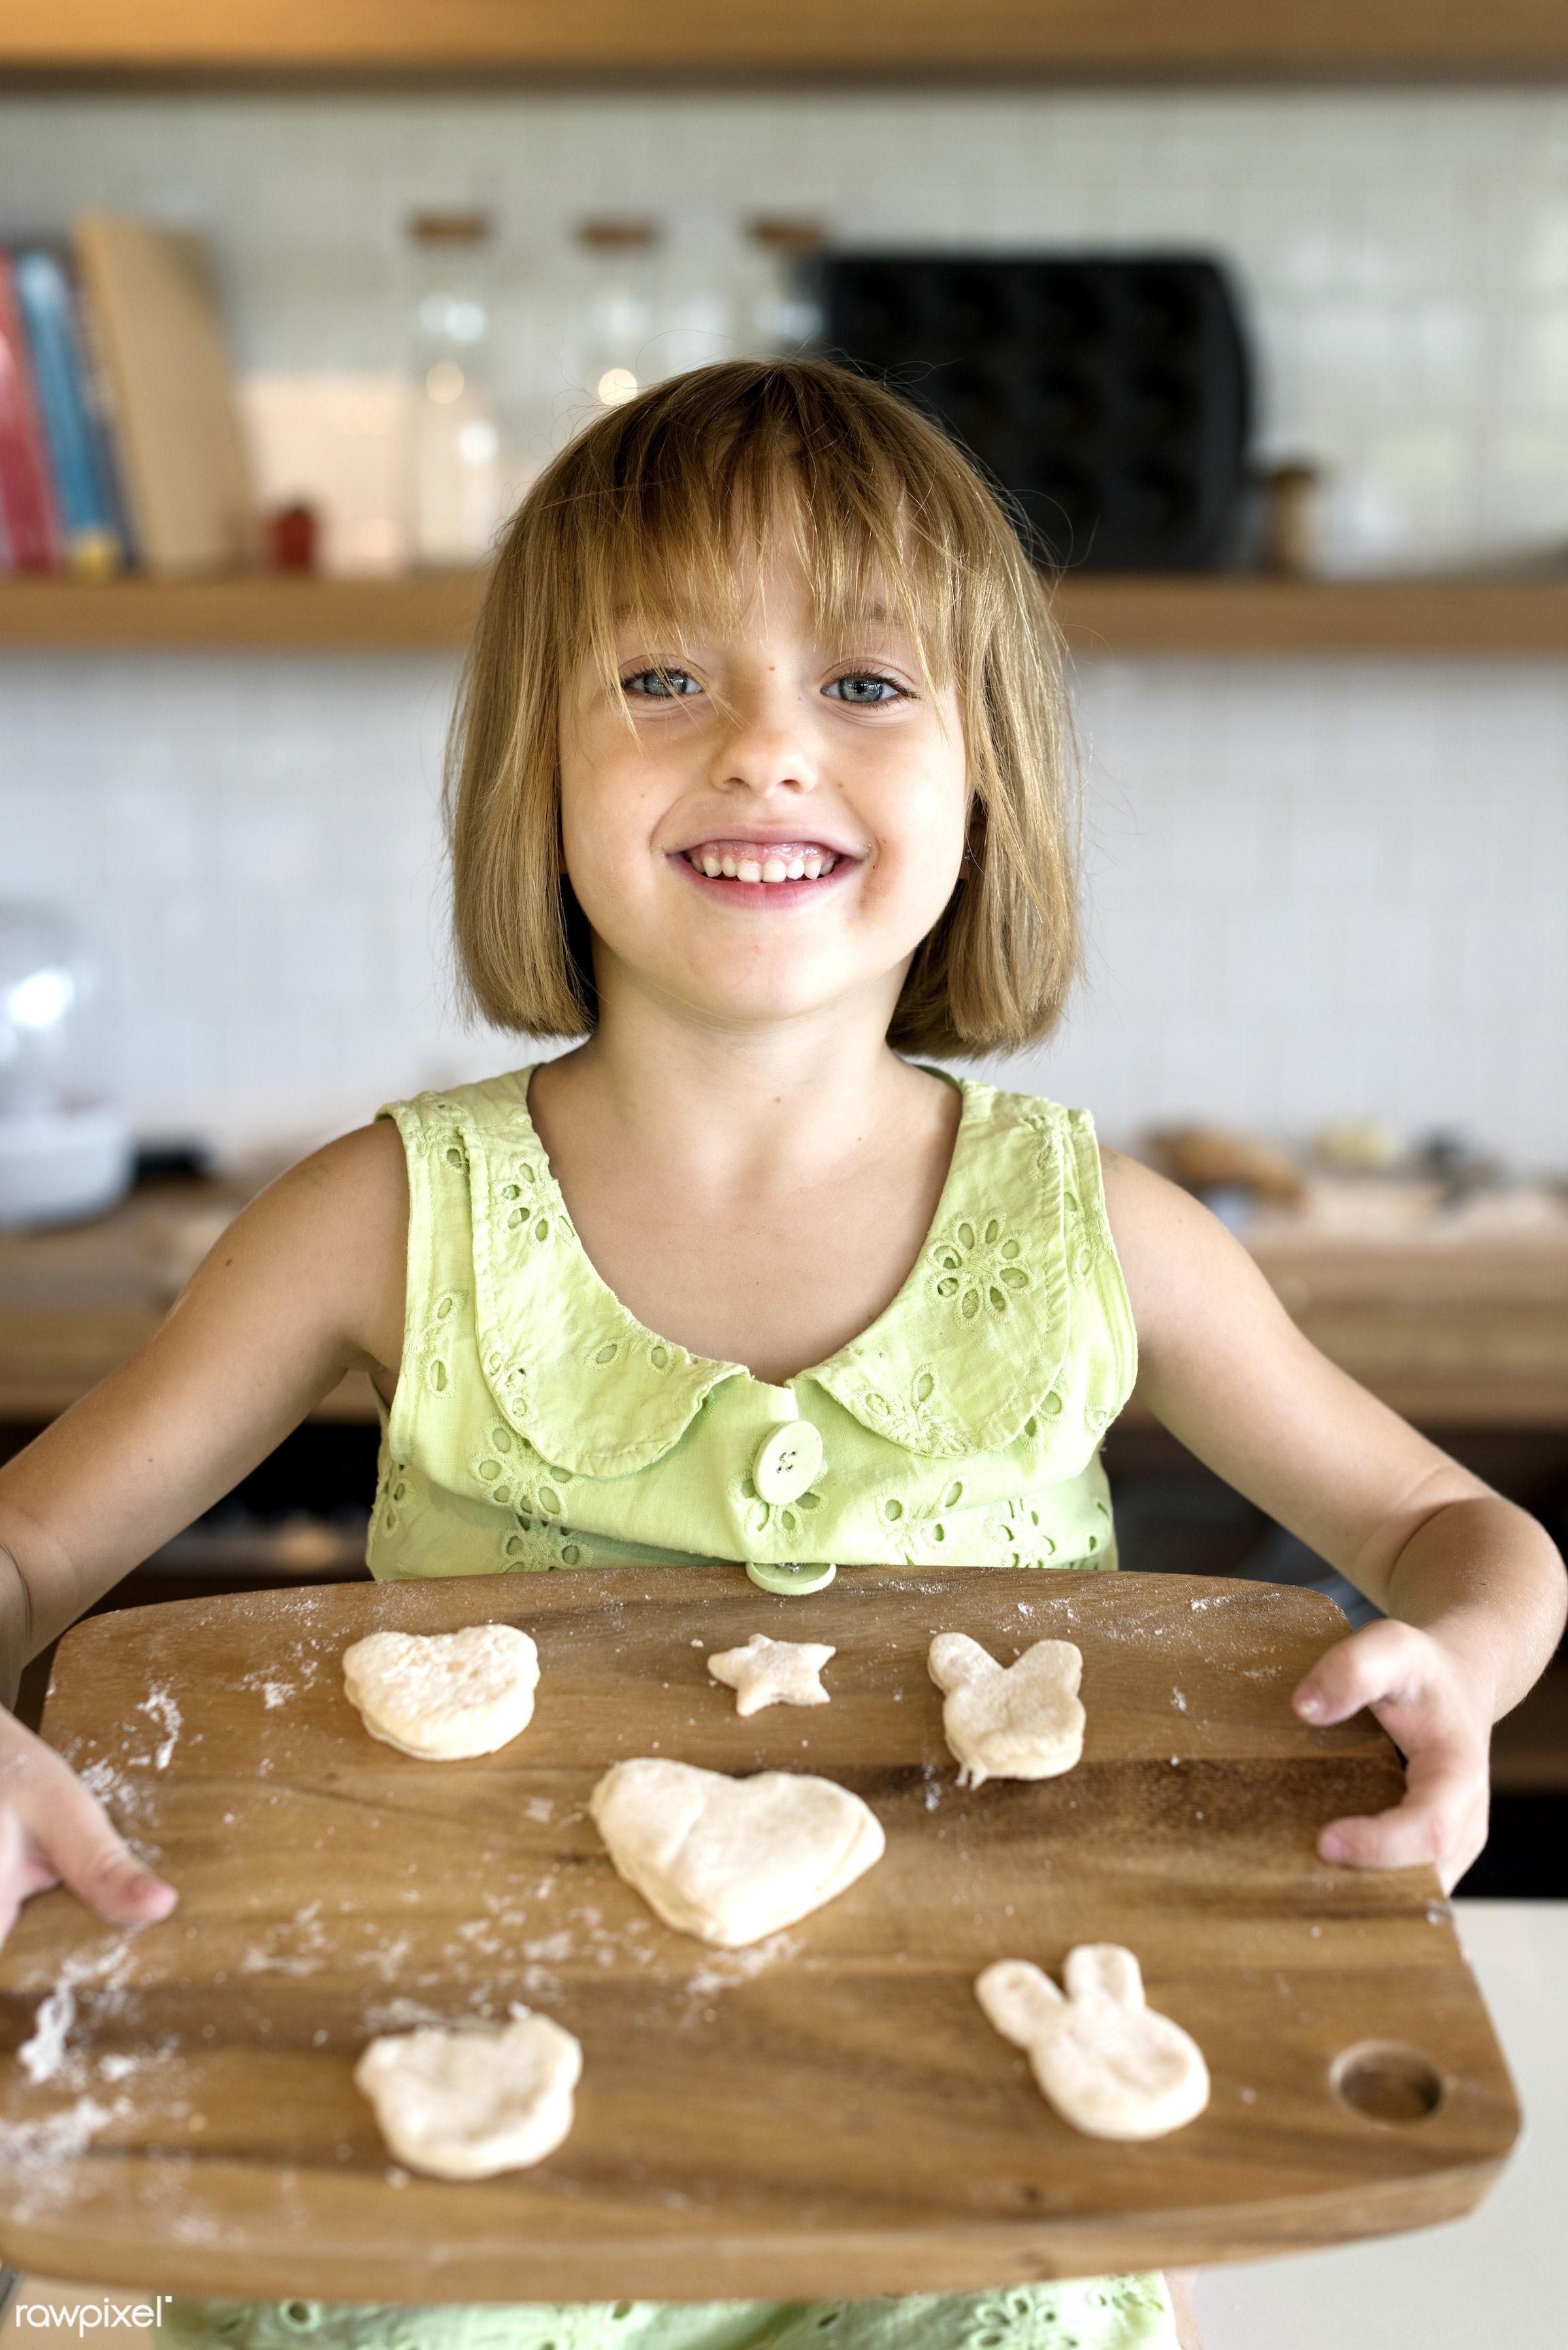 activity, alone, american, bake, baker, bakery, baking, blond, cheerful, child, cook, cookies, daughter, dessert, enjoyment...